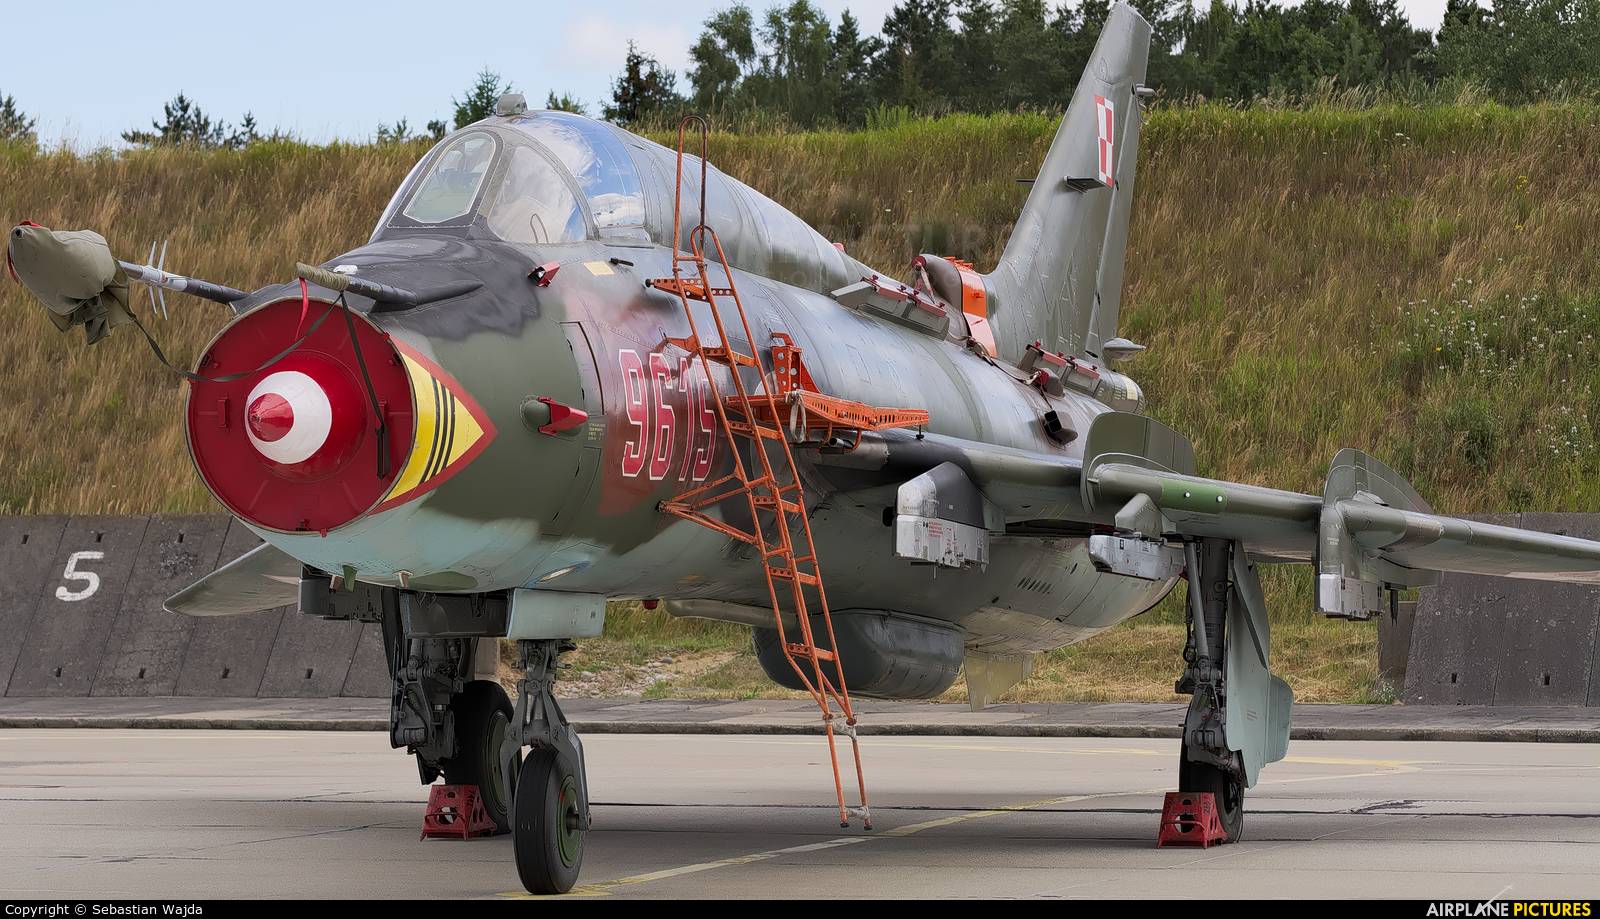 Poland - Air Force 9615 aircraft at Świdwin